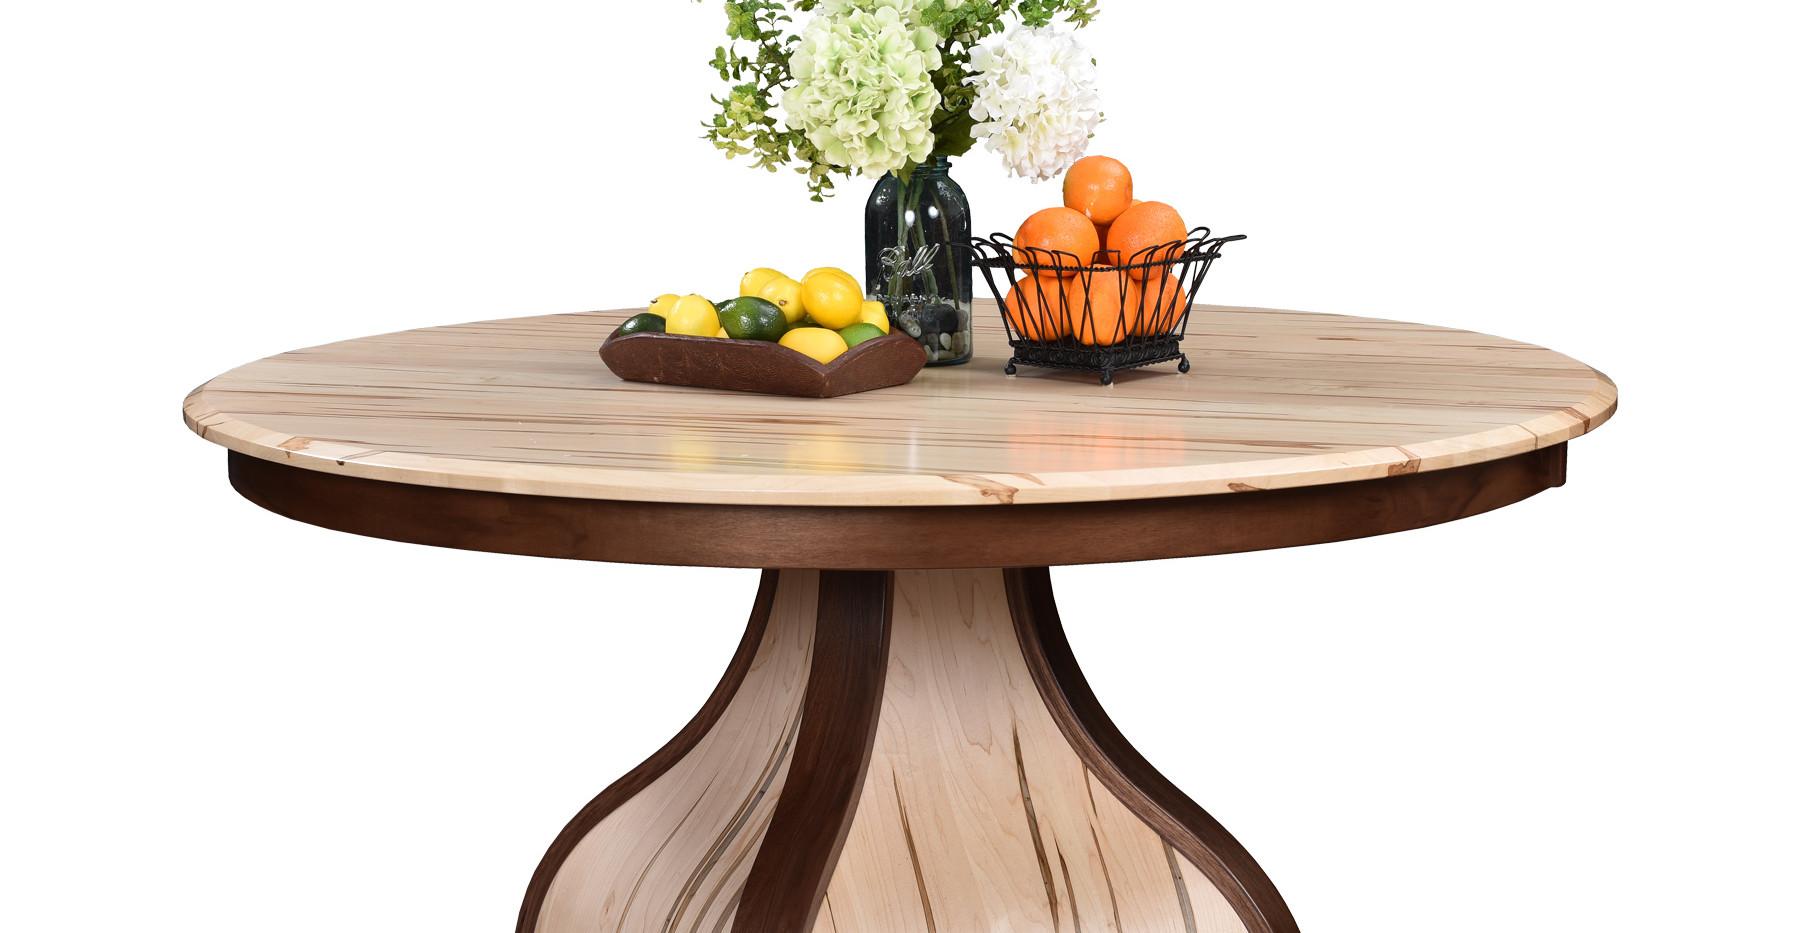 Buckingham Table